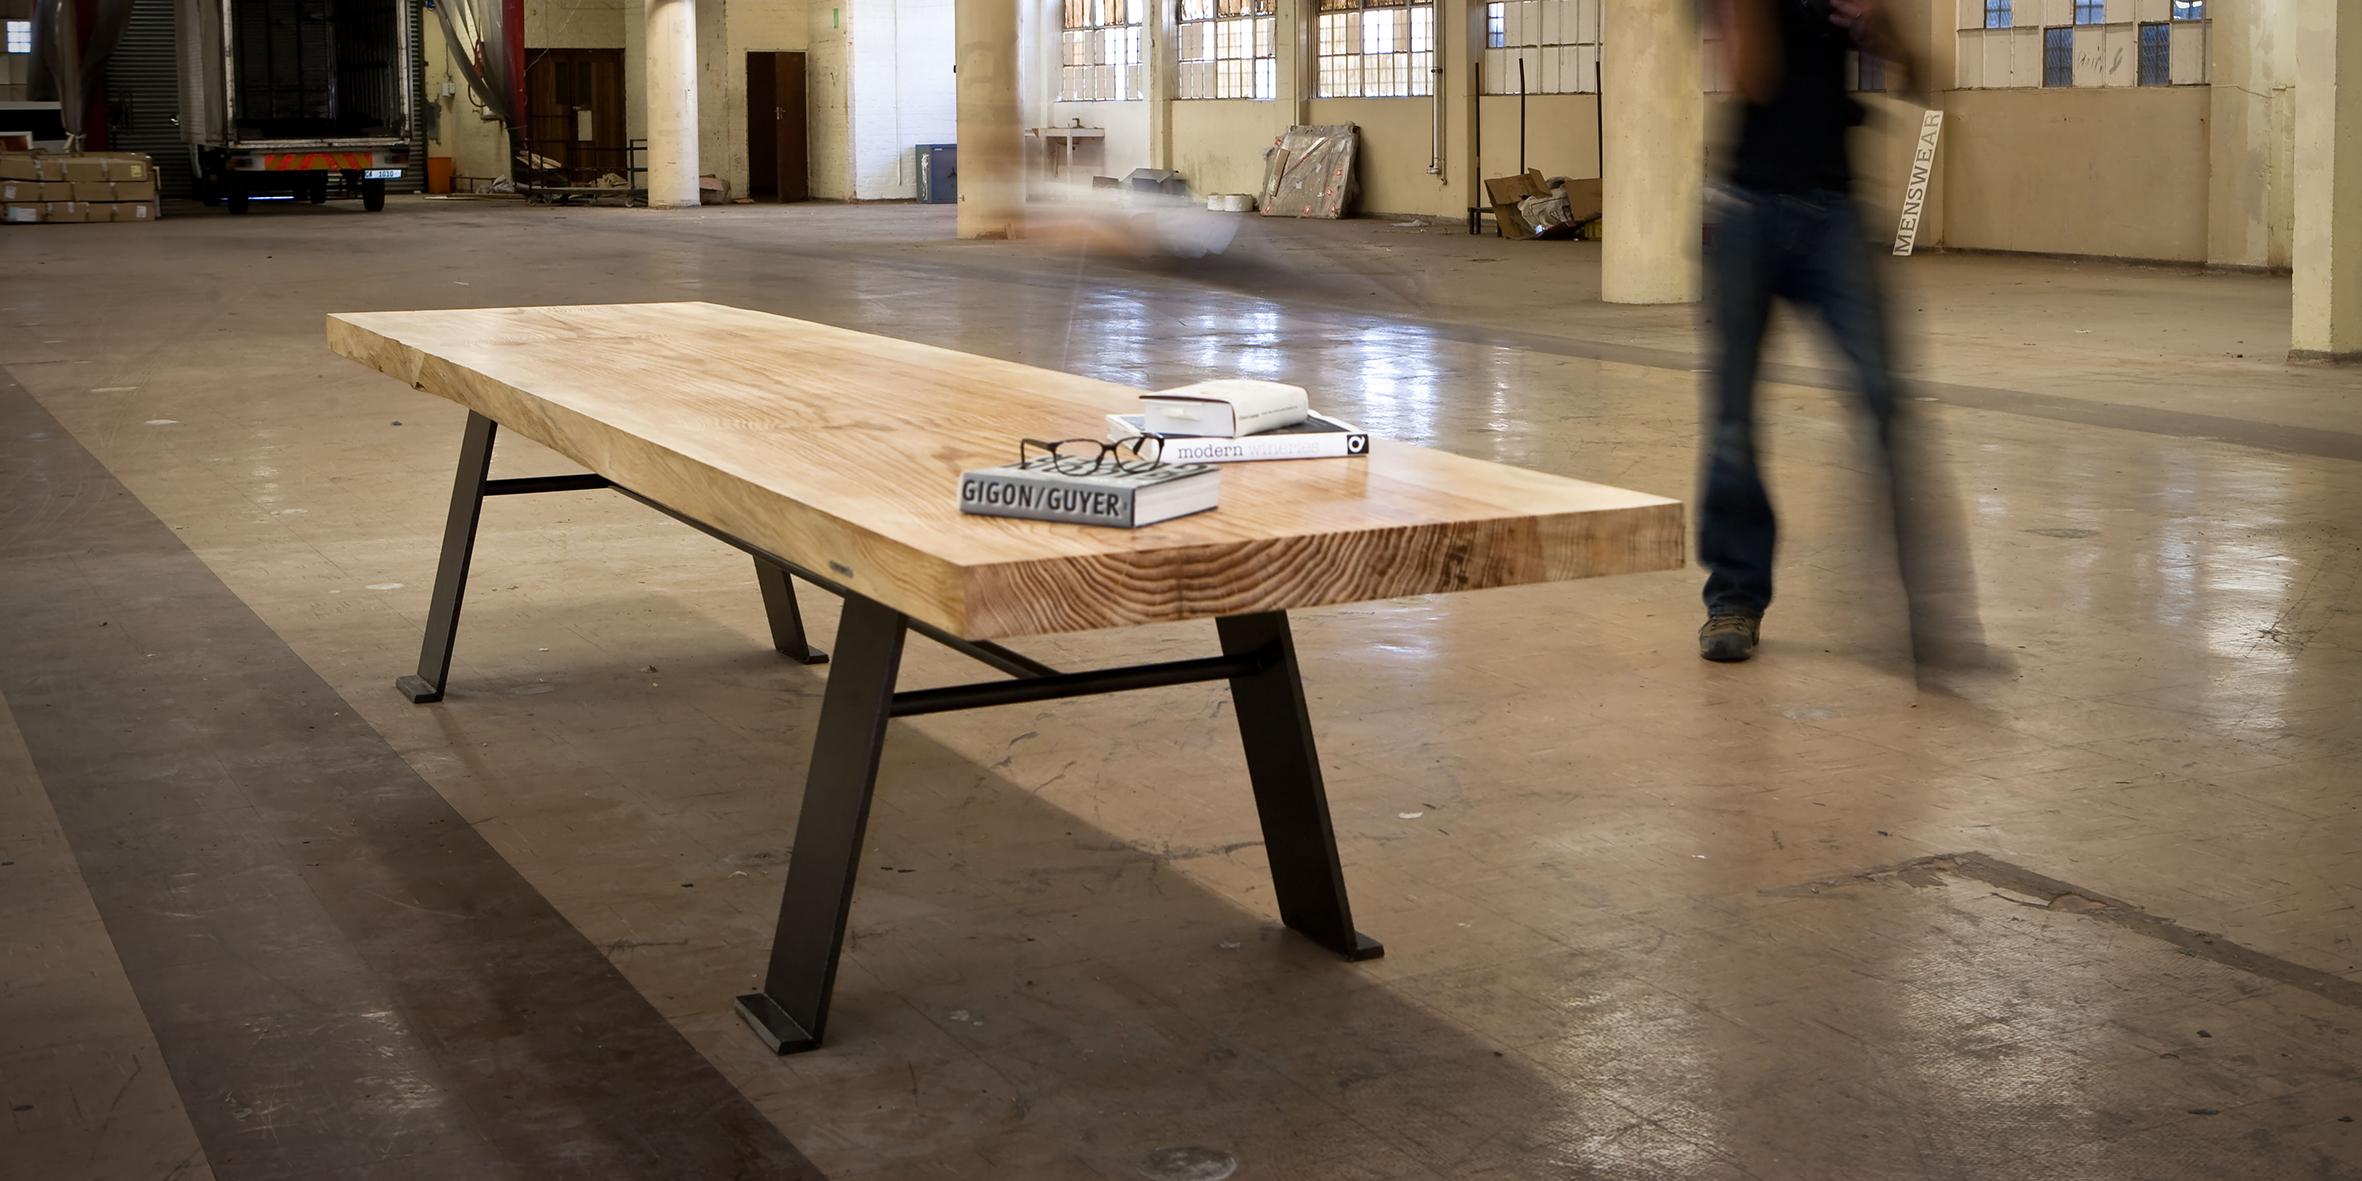 slab table, 2700 l x 1100 w x 730 h, pinasta pine top with mild steel base